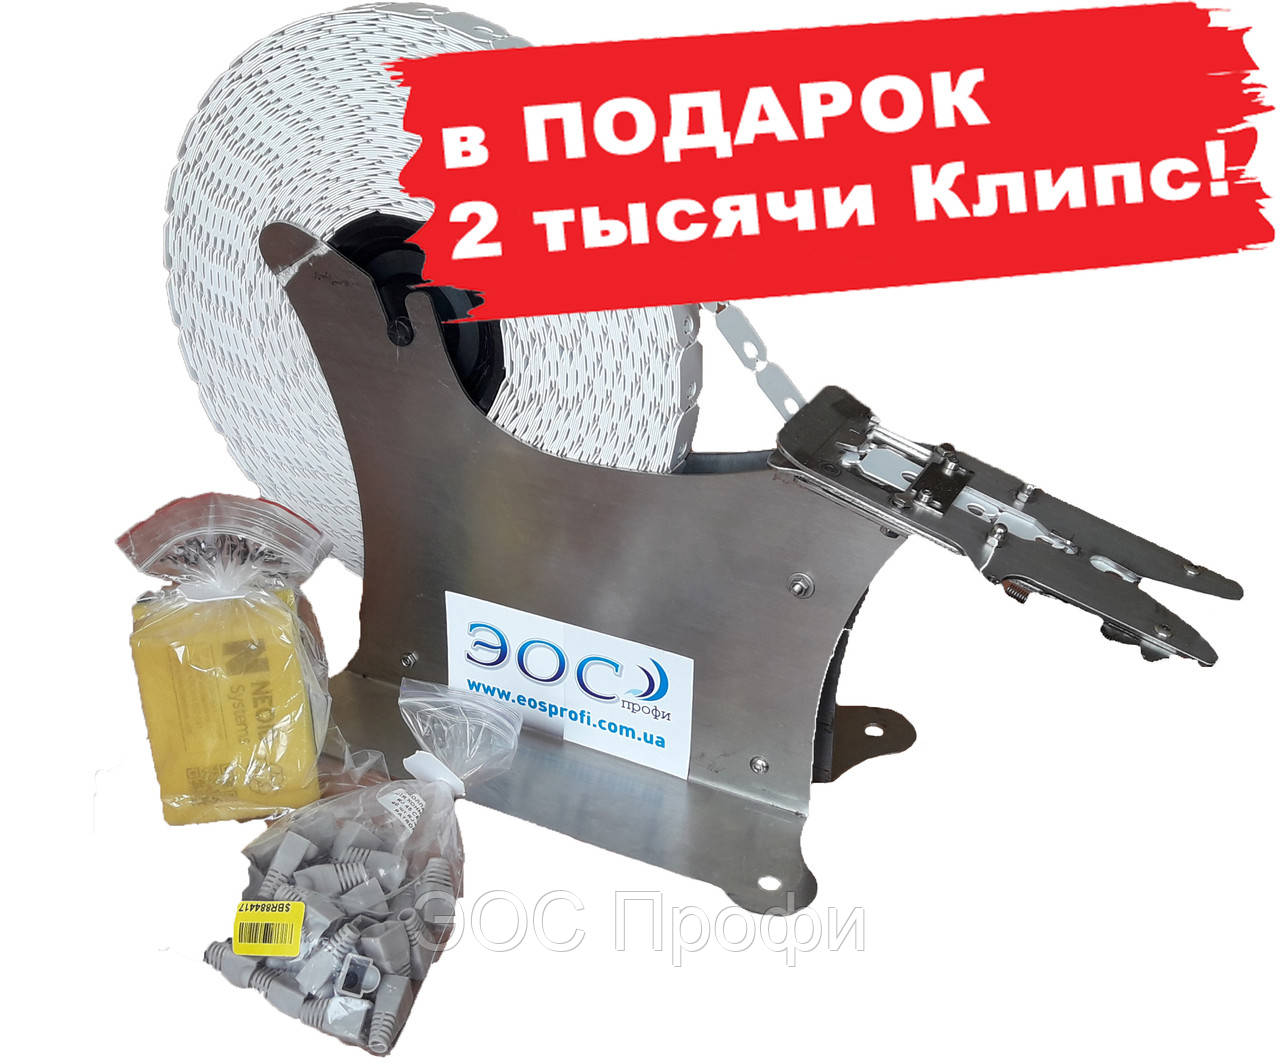 Клипсатор для пакетов Fast Lock